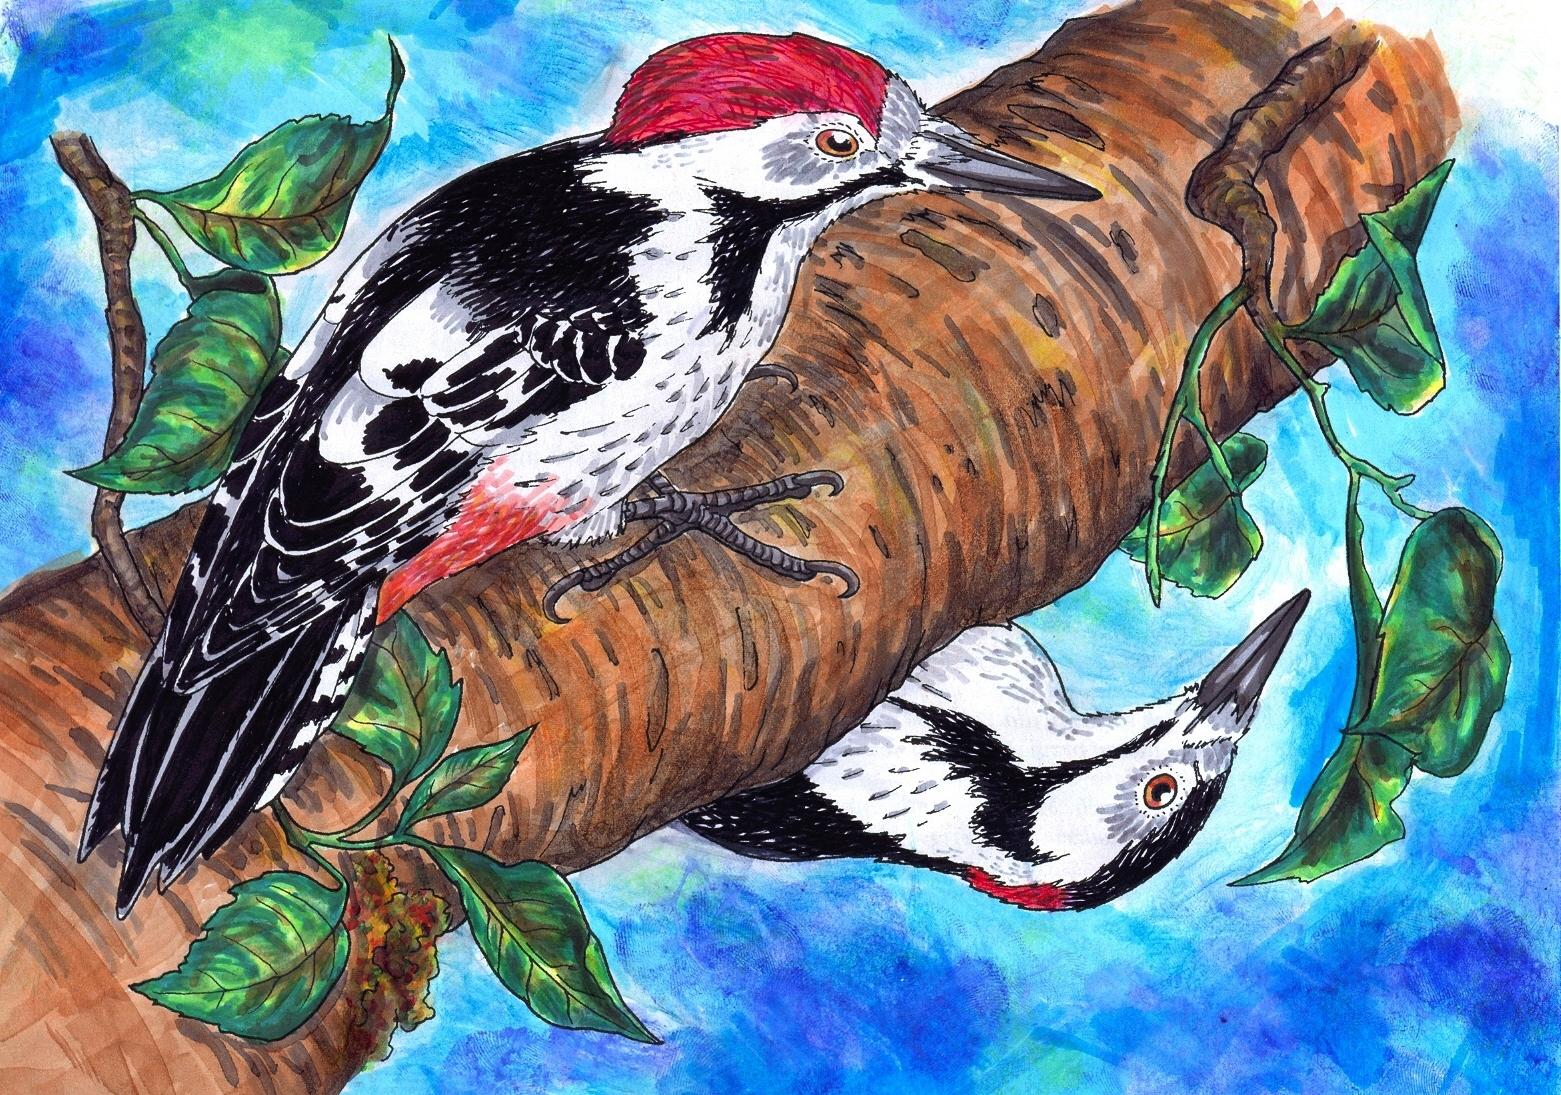 [RYSUNKI]- czyli mini Deviant Saf - Page 6 Woodpeckers_by_fandragonball-da0b8hb